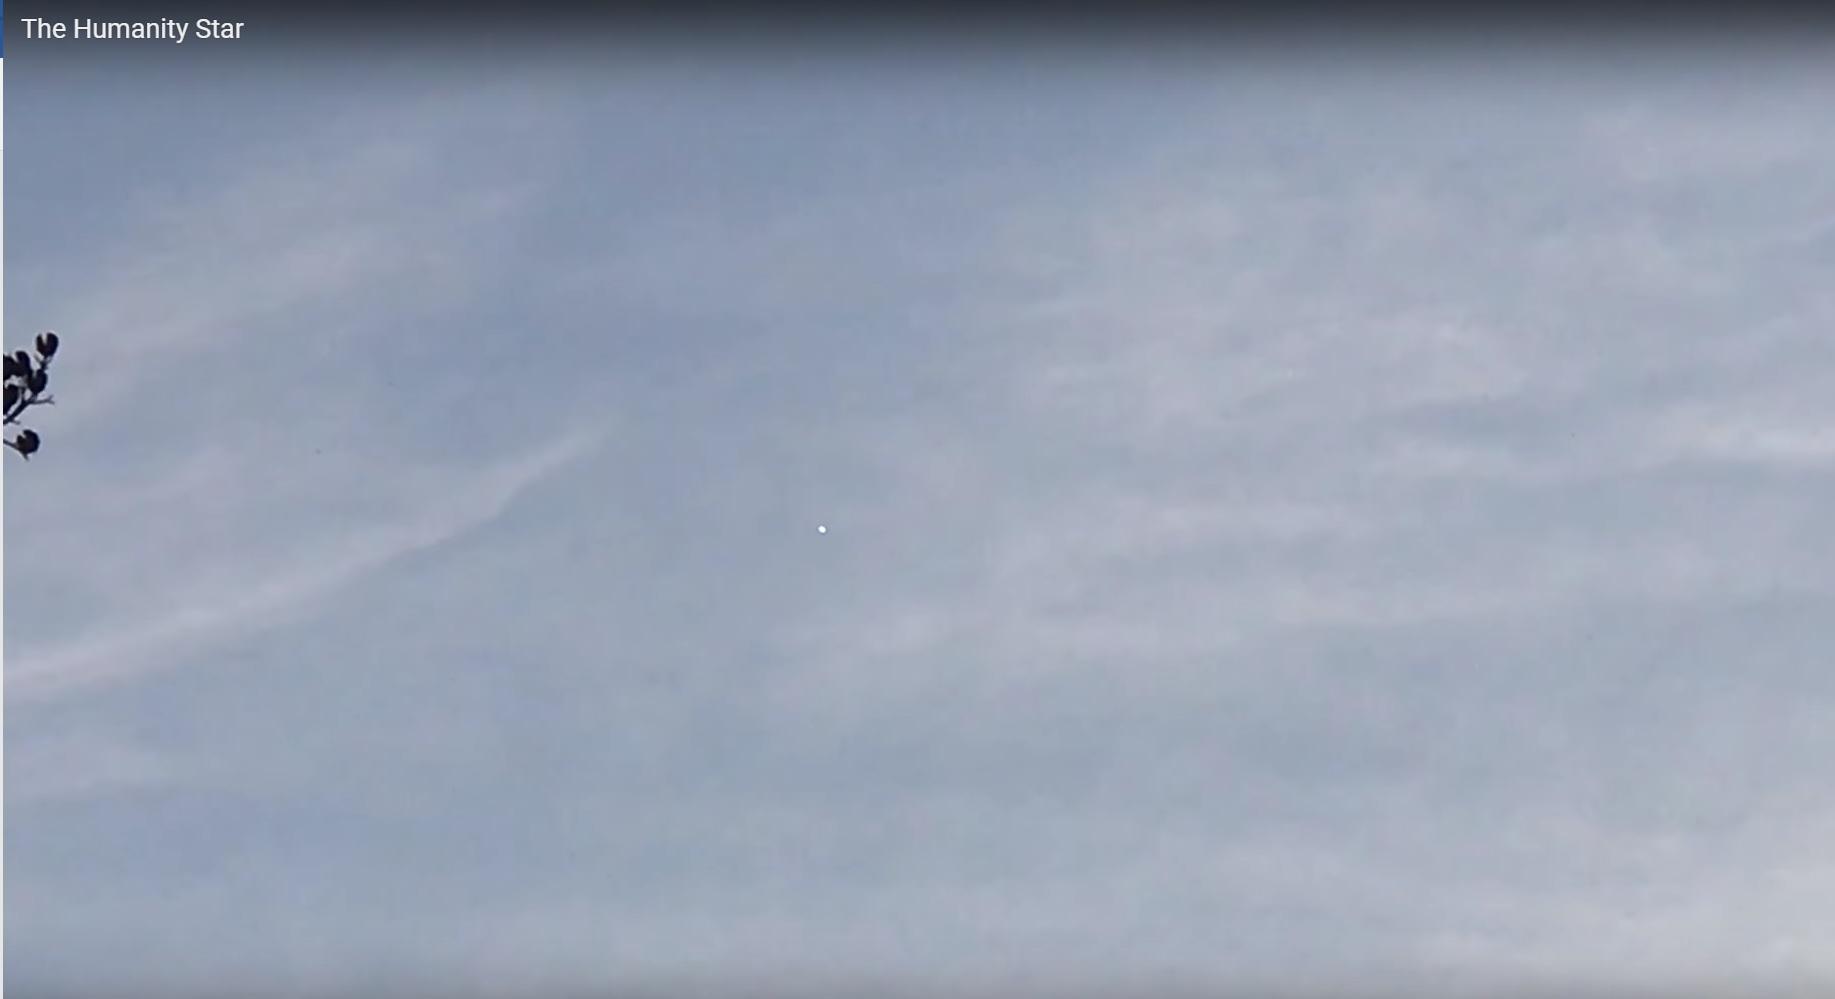 Облачно, вероятна неотключаемая реклама на звездном небе - 9